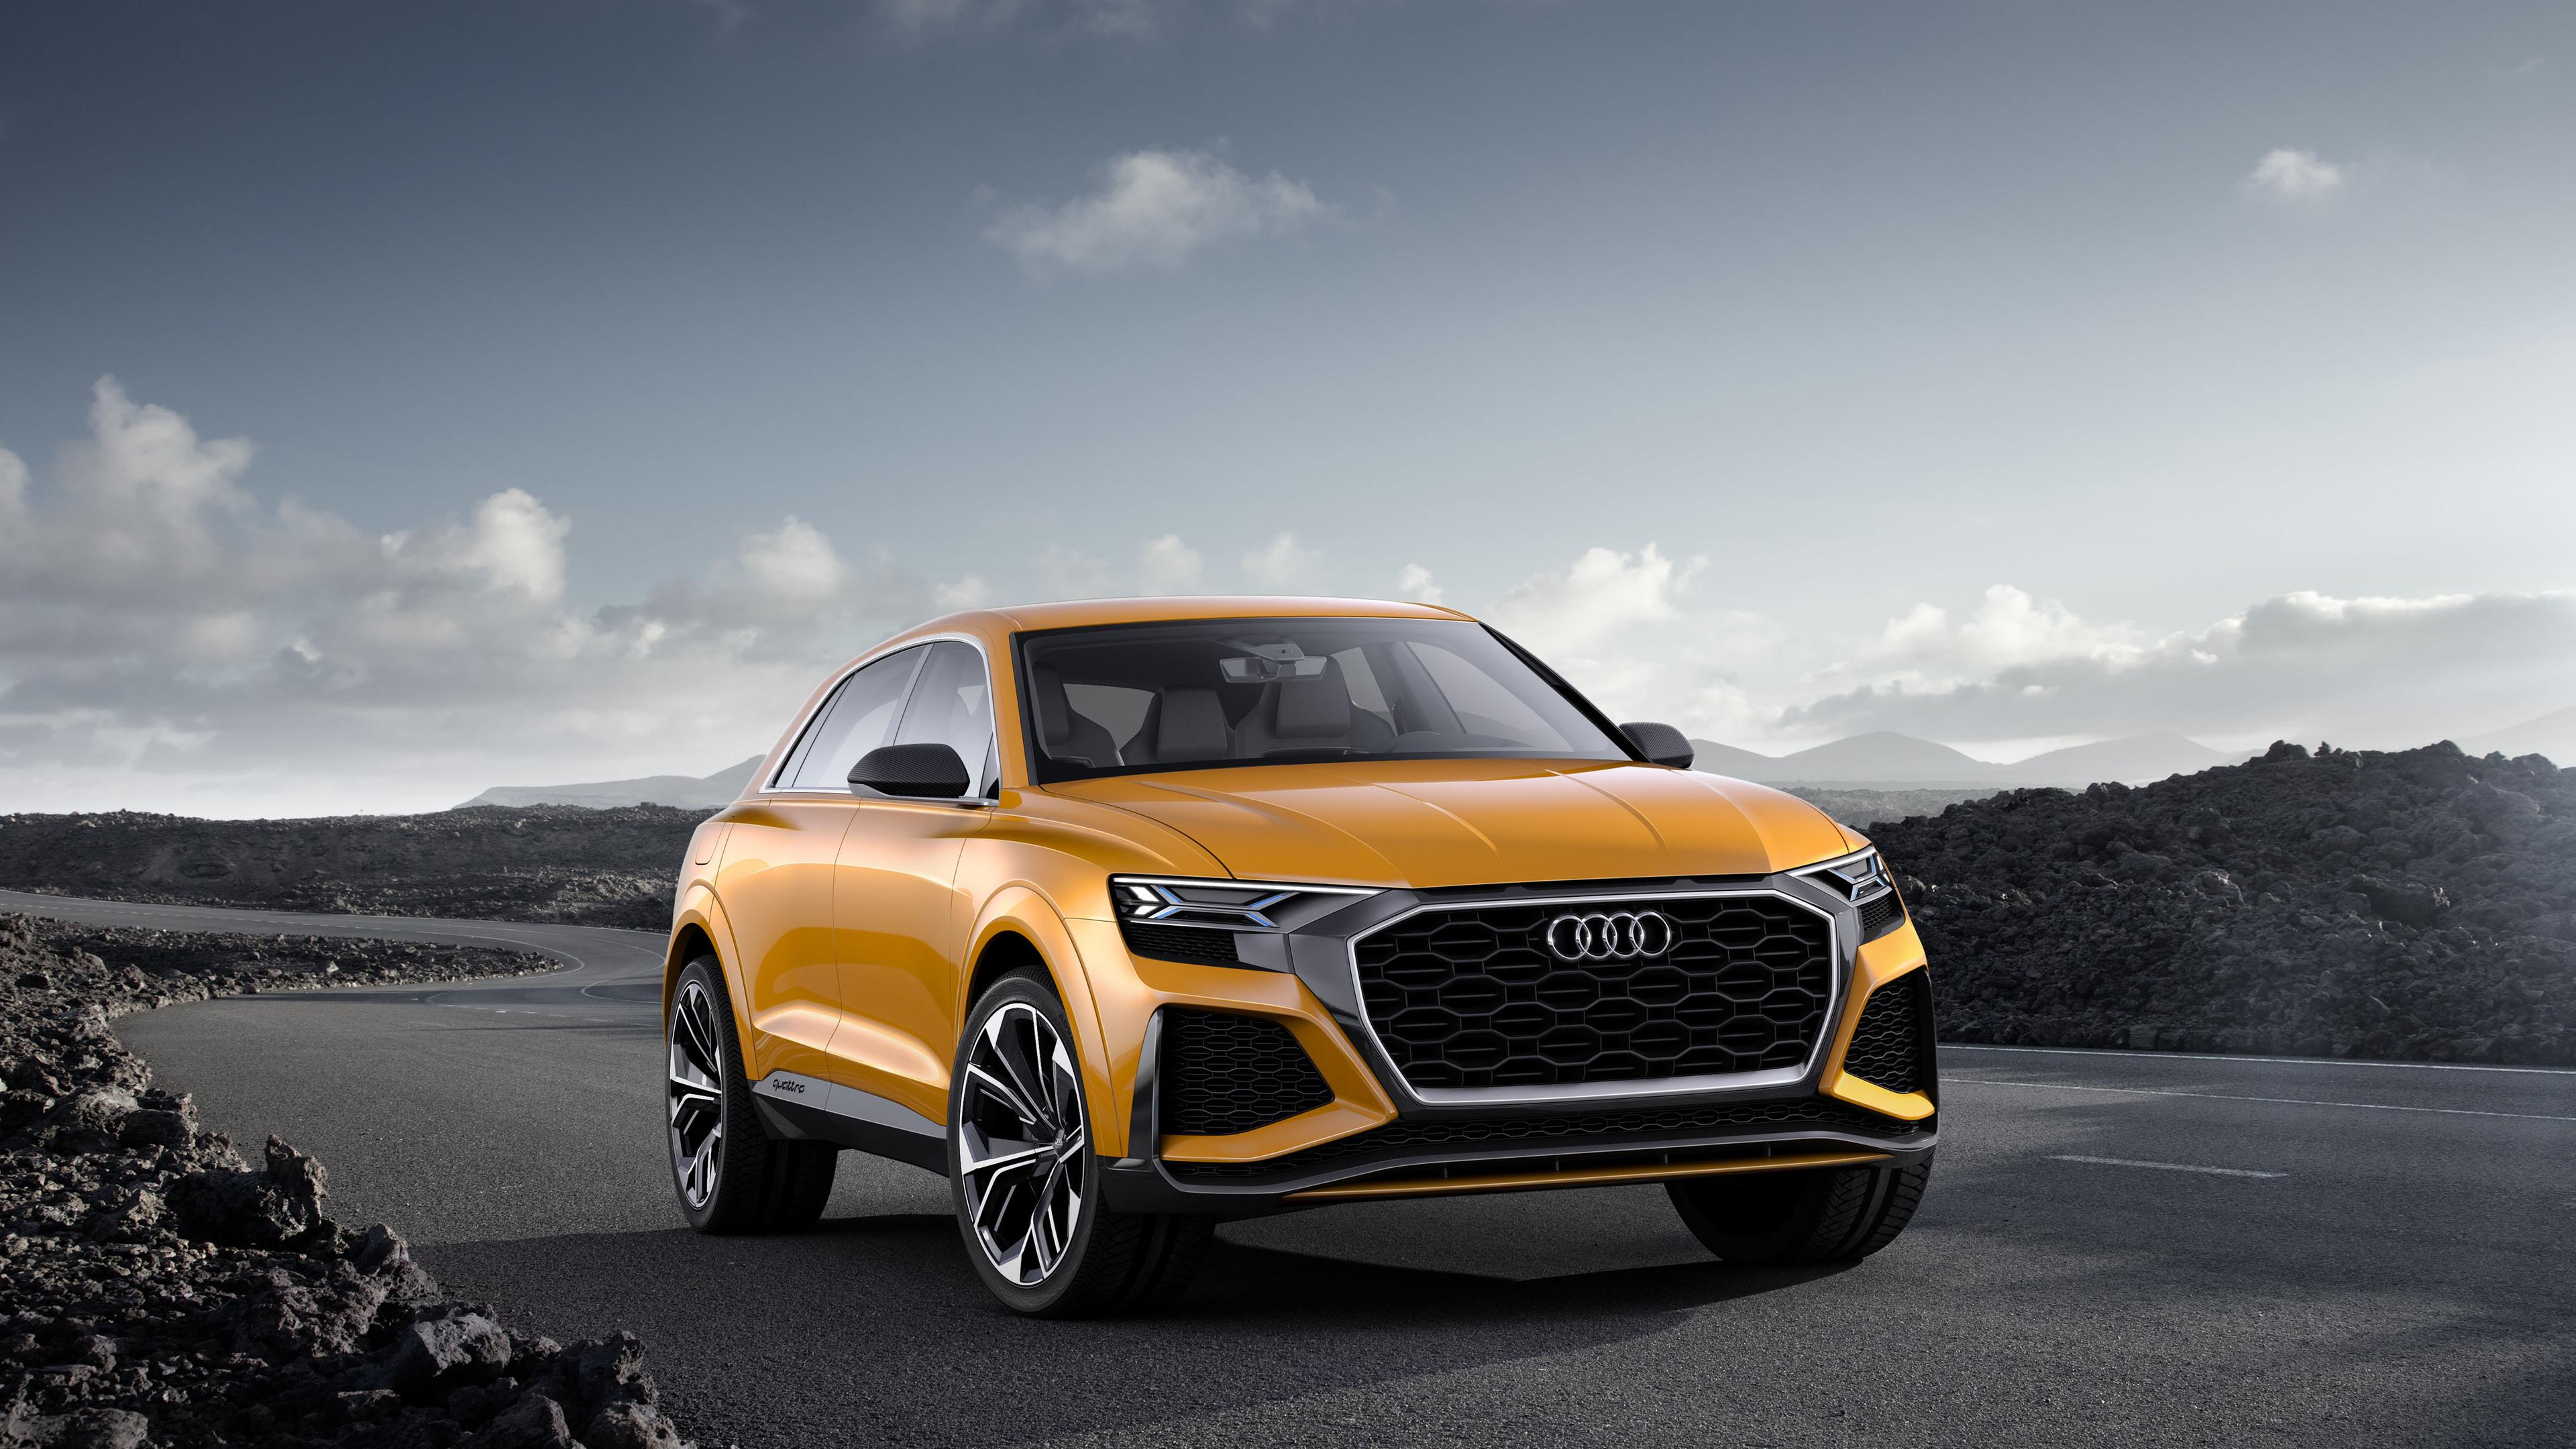 audi q8 sport concept 1539105151 - Audi Q8 Sport Concept - hd-wallpapers, concept cars wallpapers, cars wallpapers, audi wallpapers, audi q8 wallpapers, 4k-wallpapers, 2017 cars wallpapers